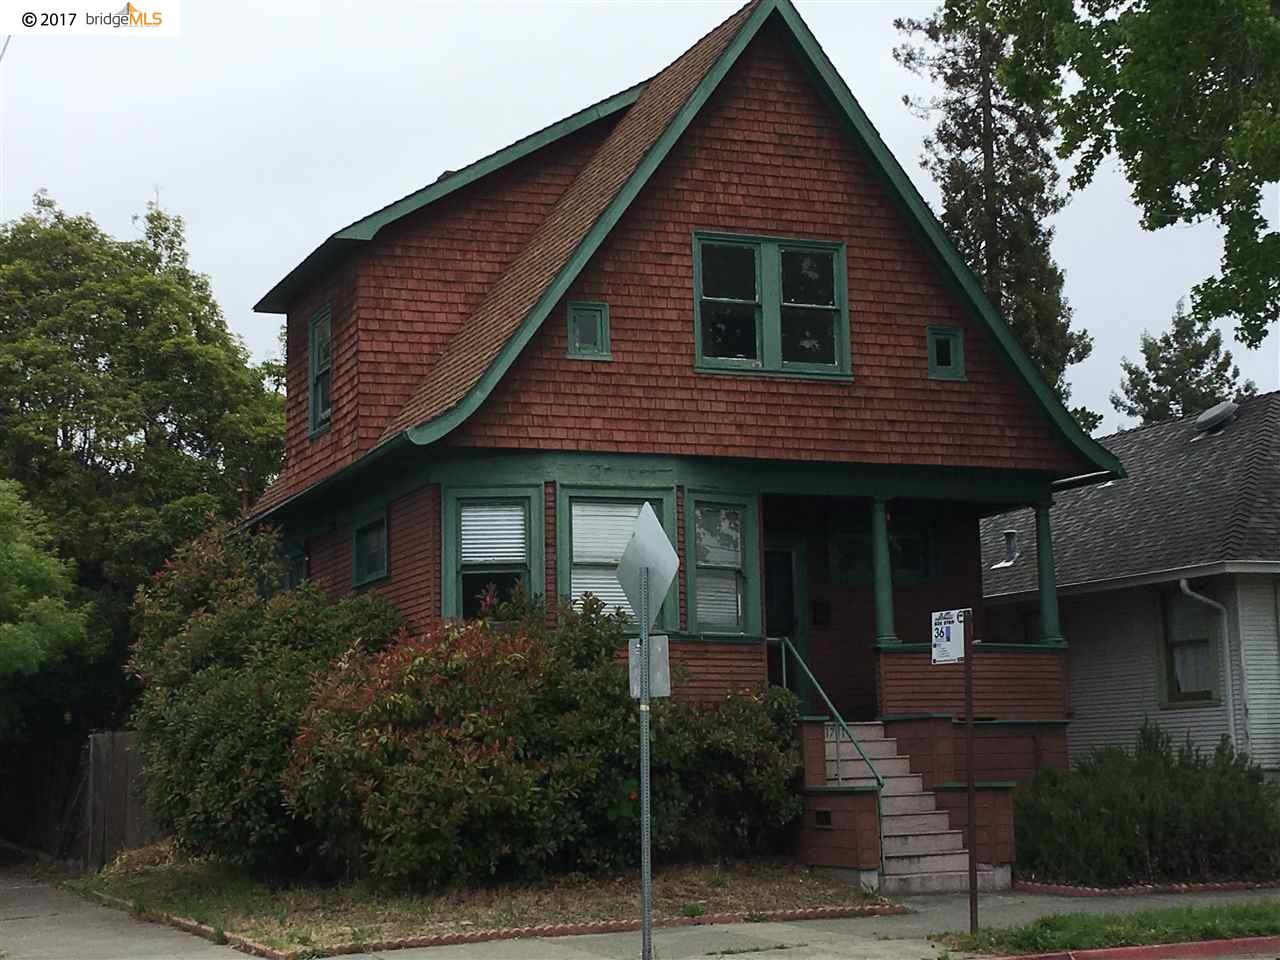 1701 Dwight Way, BERKELEY, CA 94703